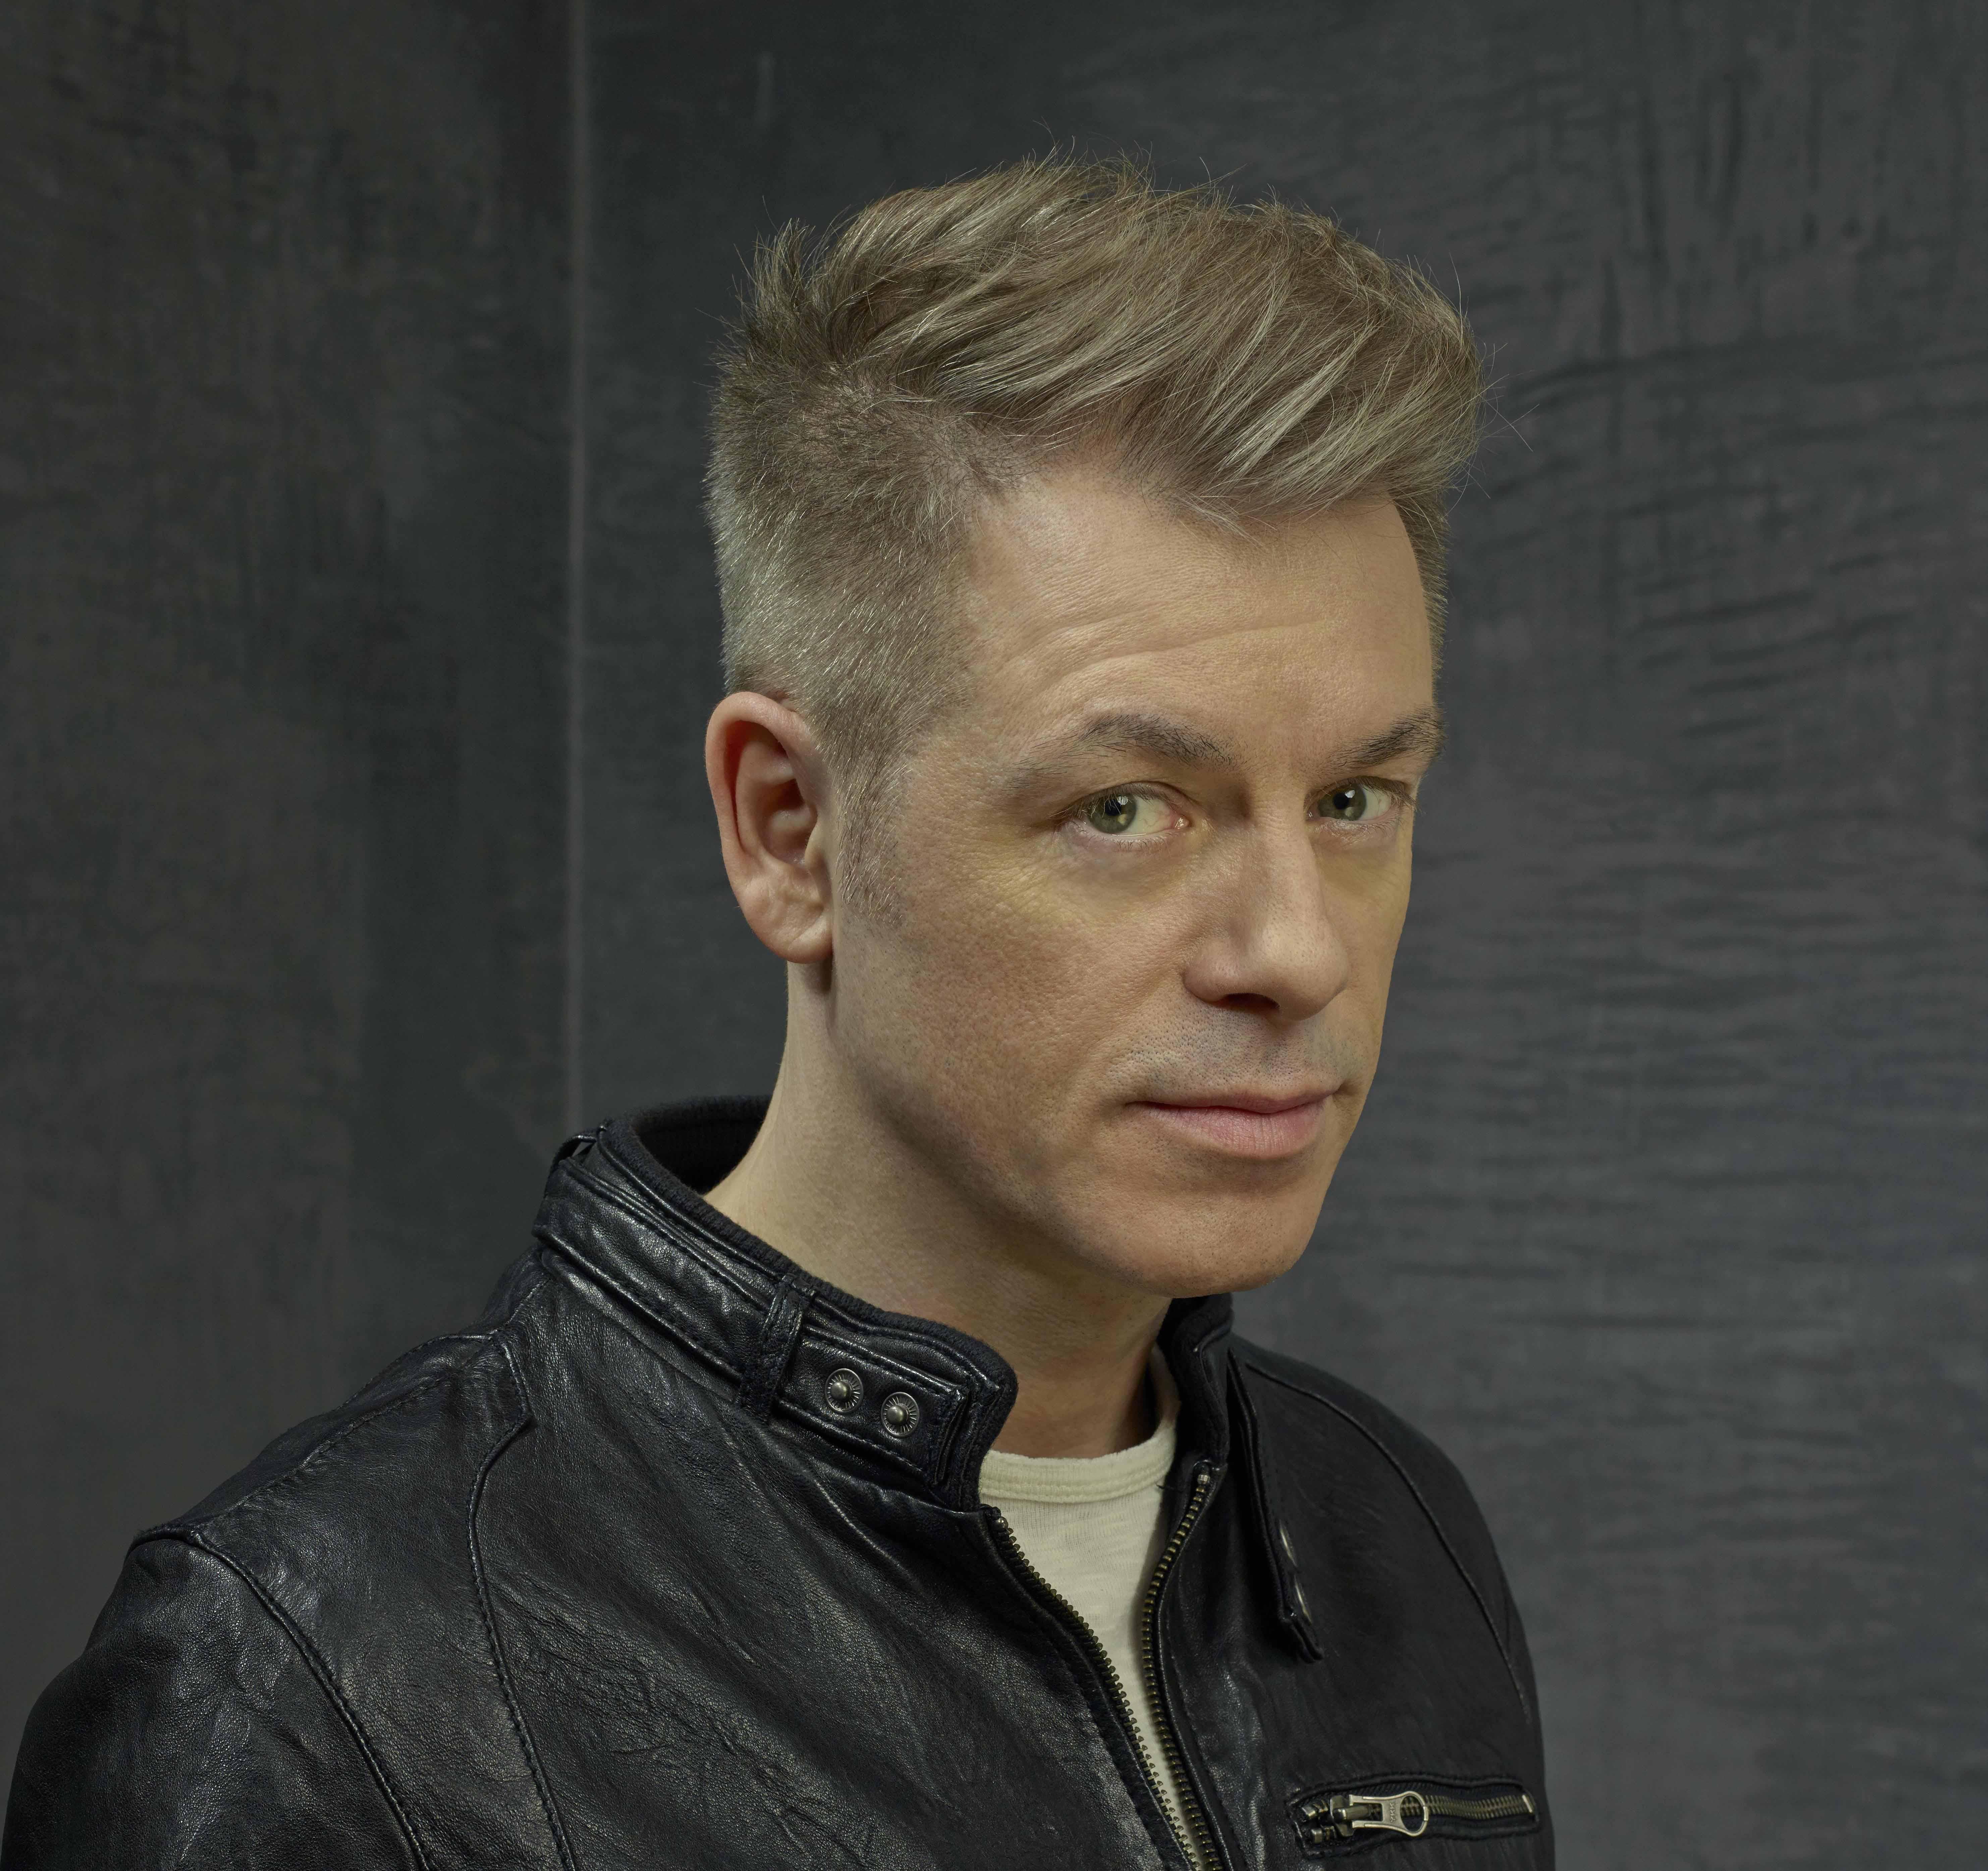 Komiker, Buchautor, Palmesel: Michael Mittermeier